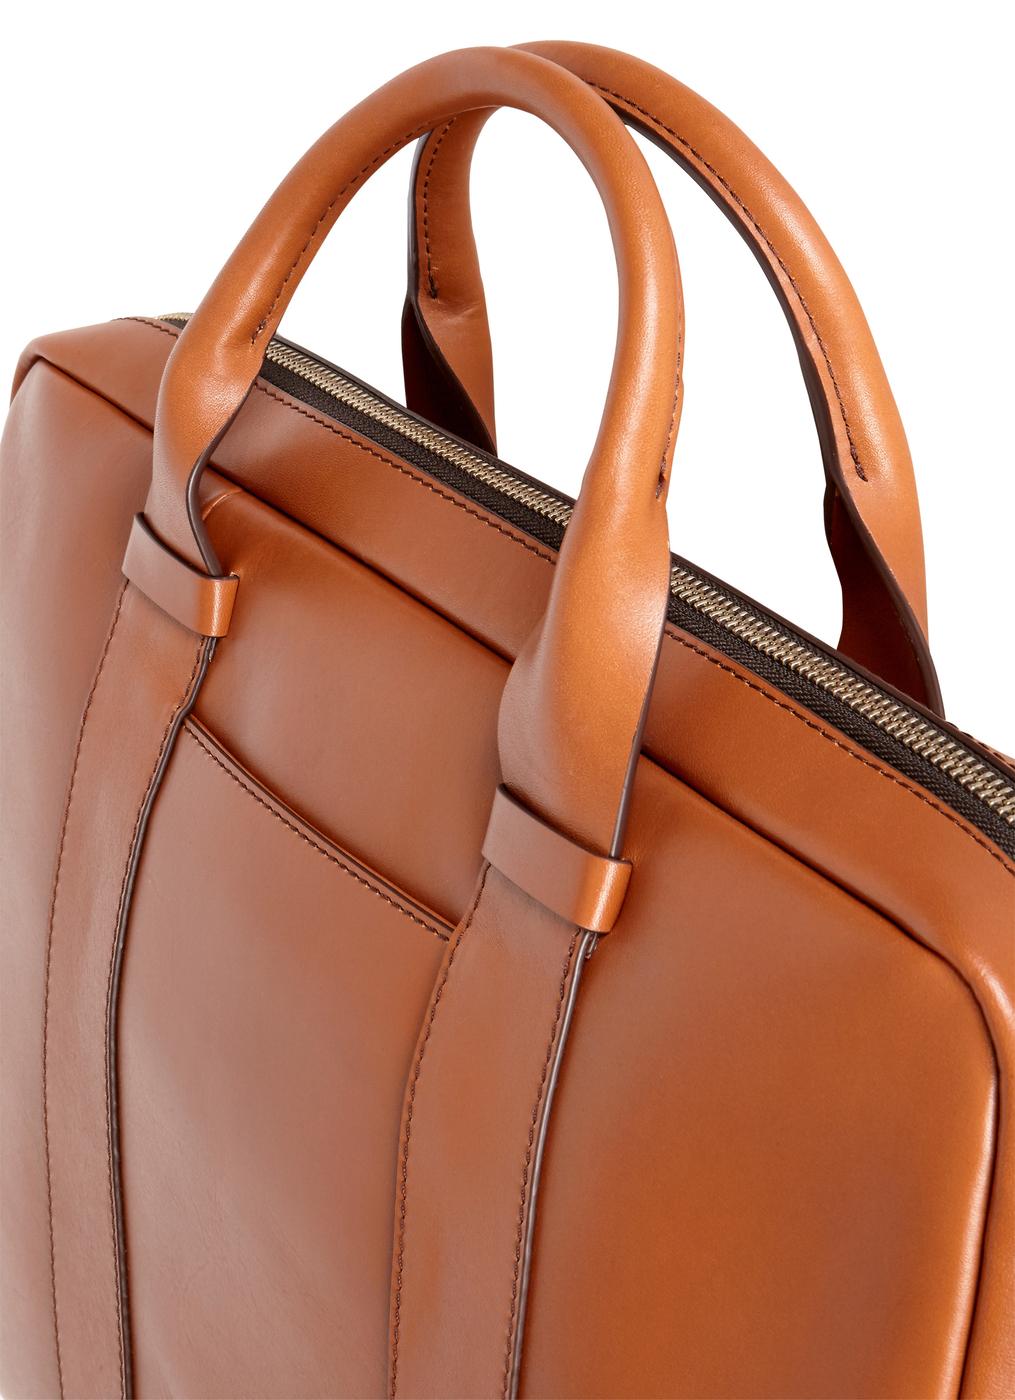 ECCO LARS Laptop Bag